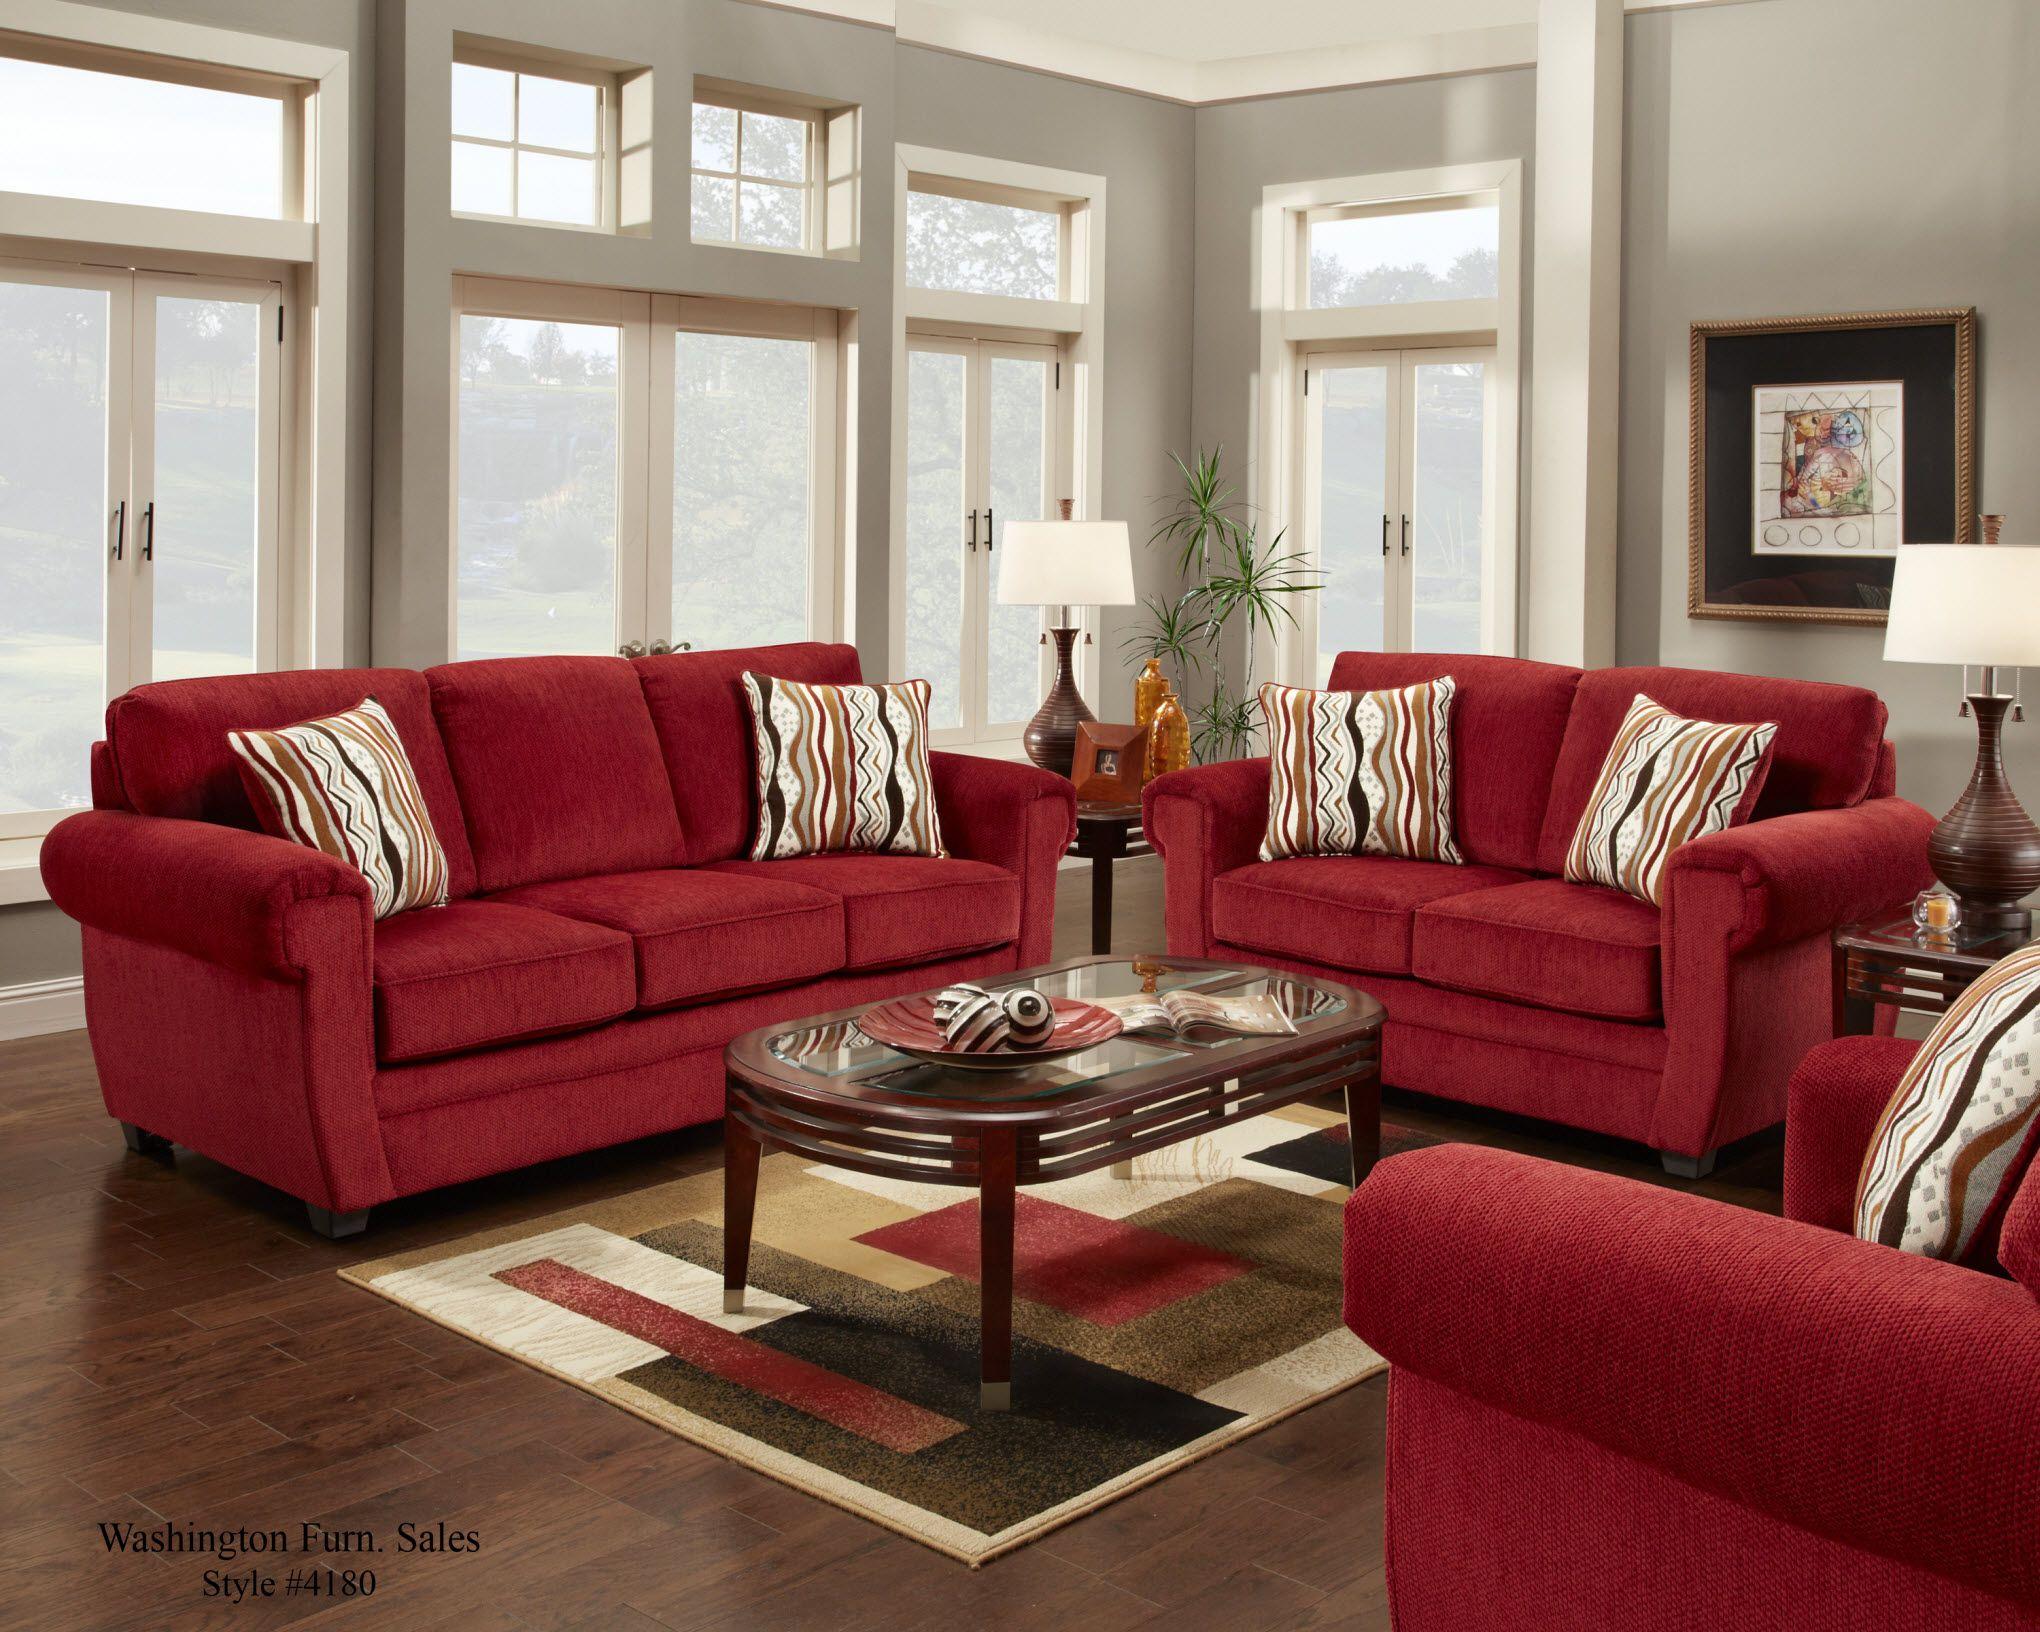 8 Living Room Paint Ideas Red Sofa Living Room Living Room Decor Living Room Red